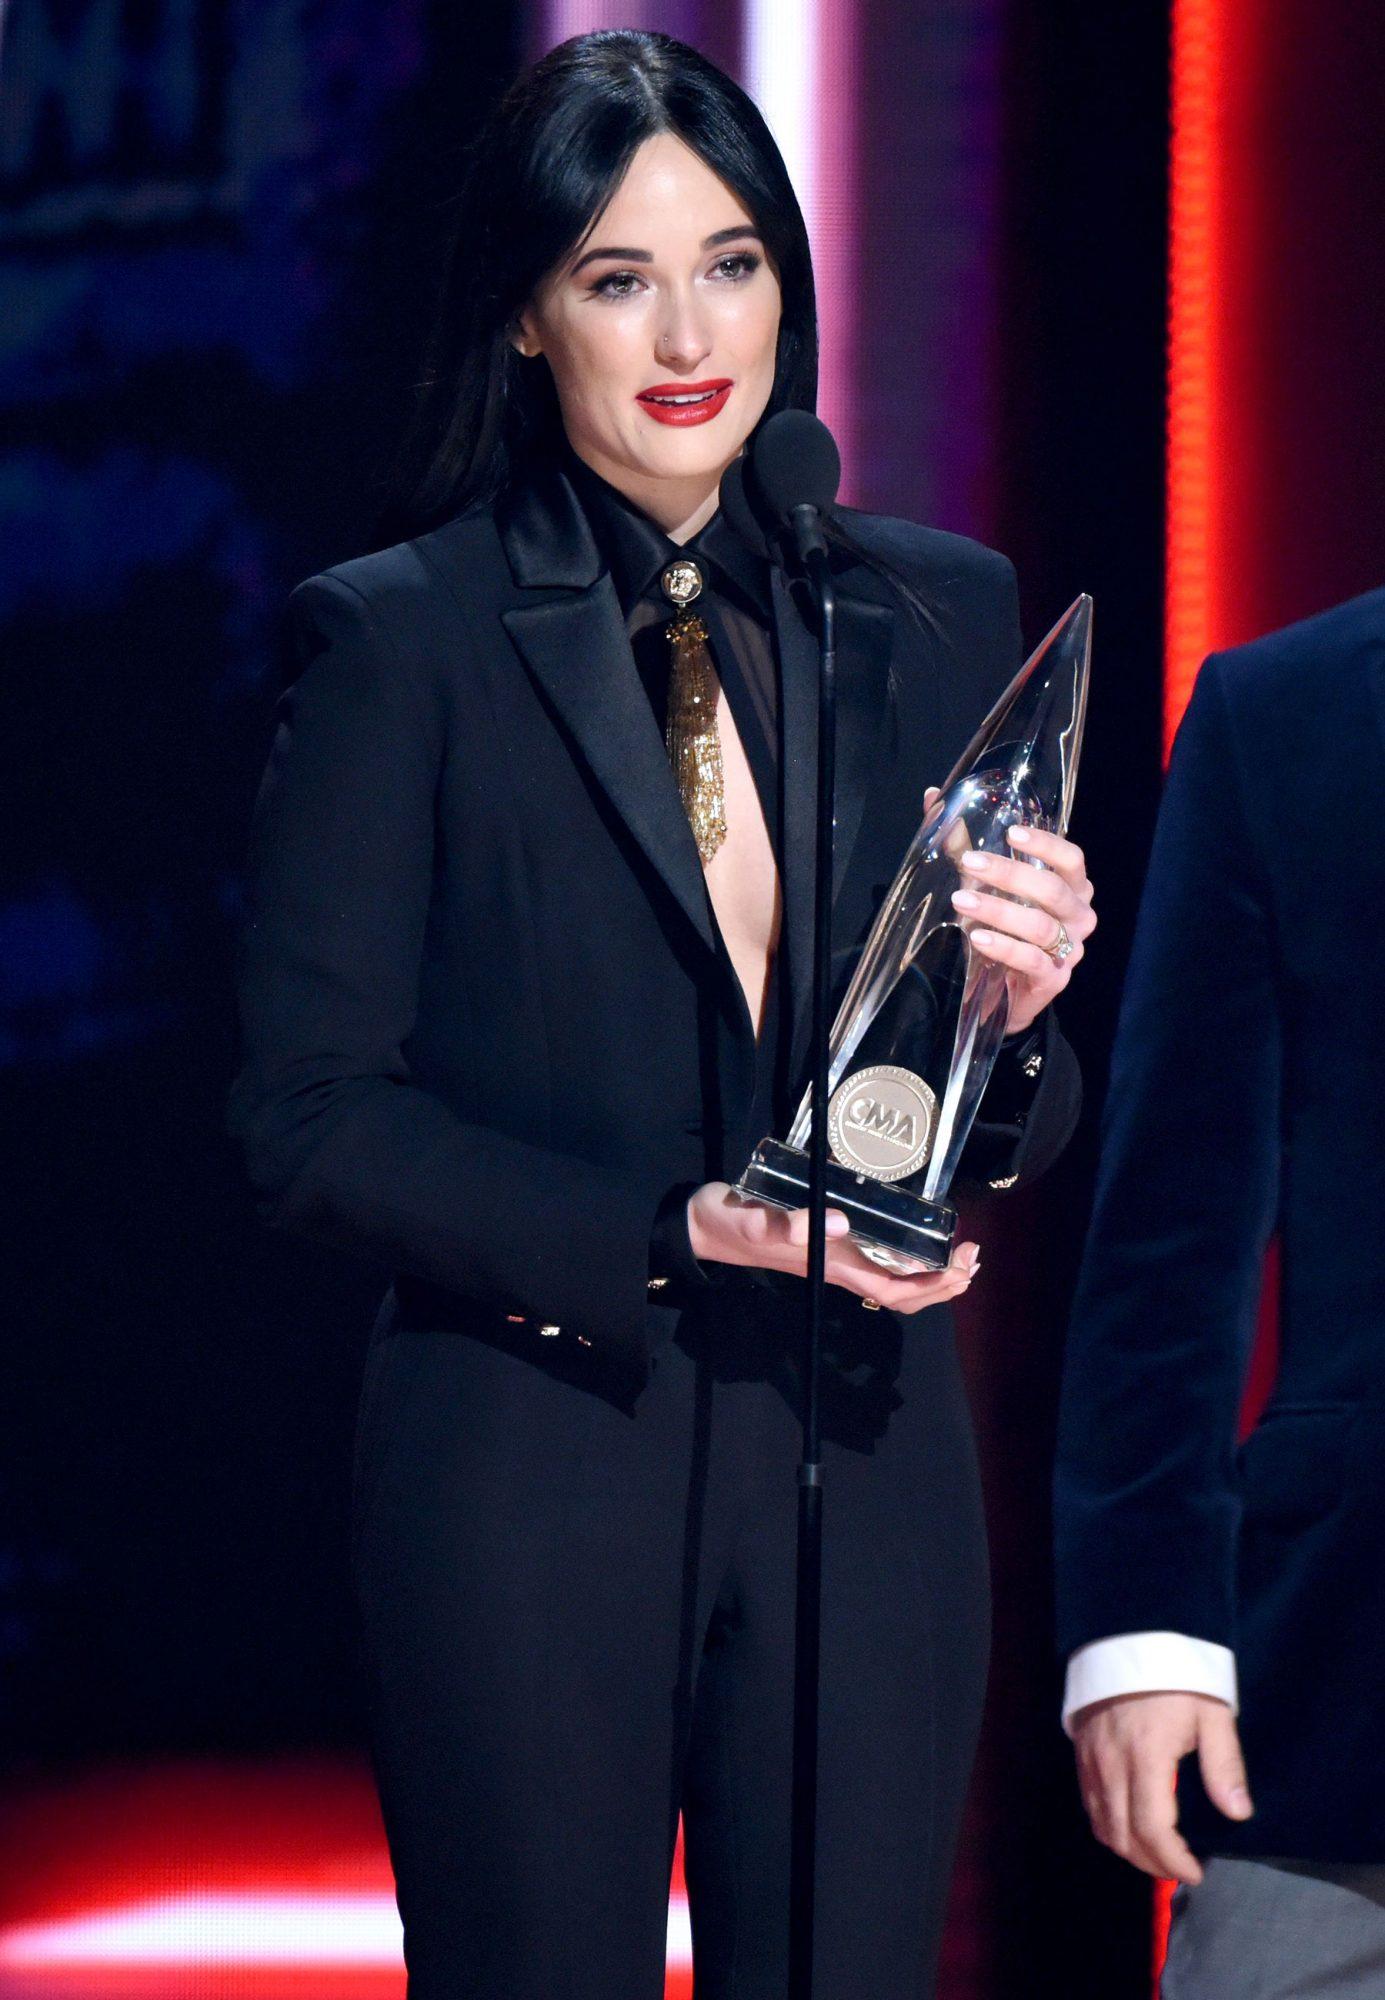 52nd Annual CMA Awards, Show, Nashville, USA - 14 Nov 2018